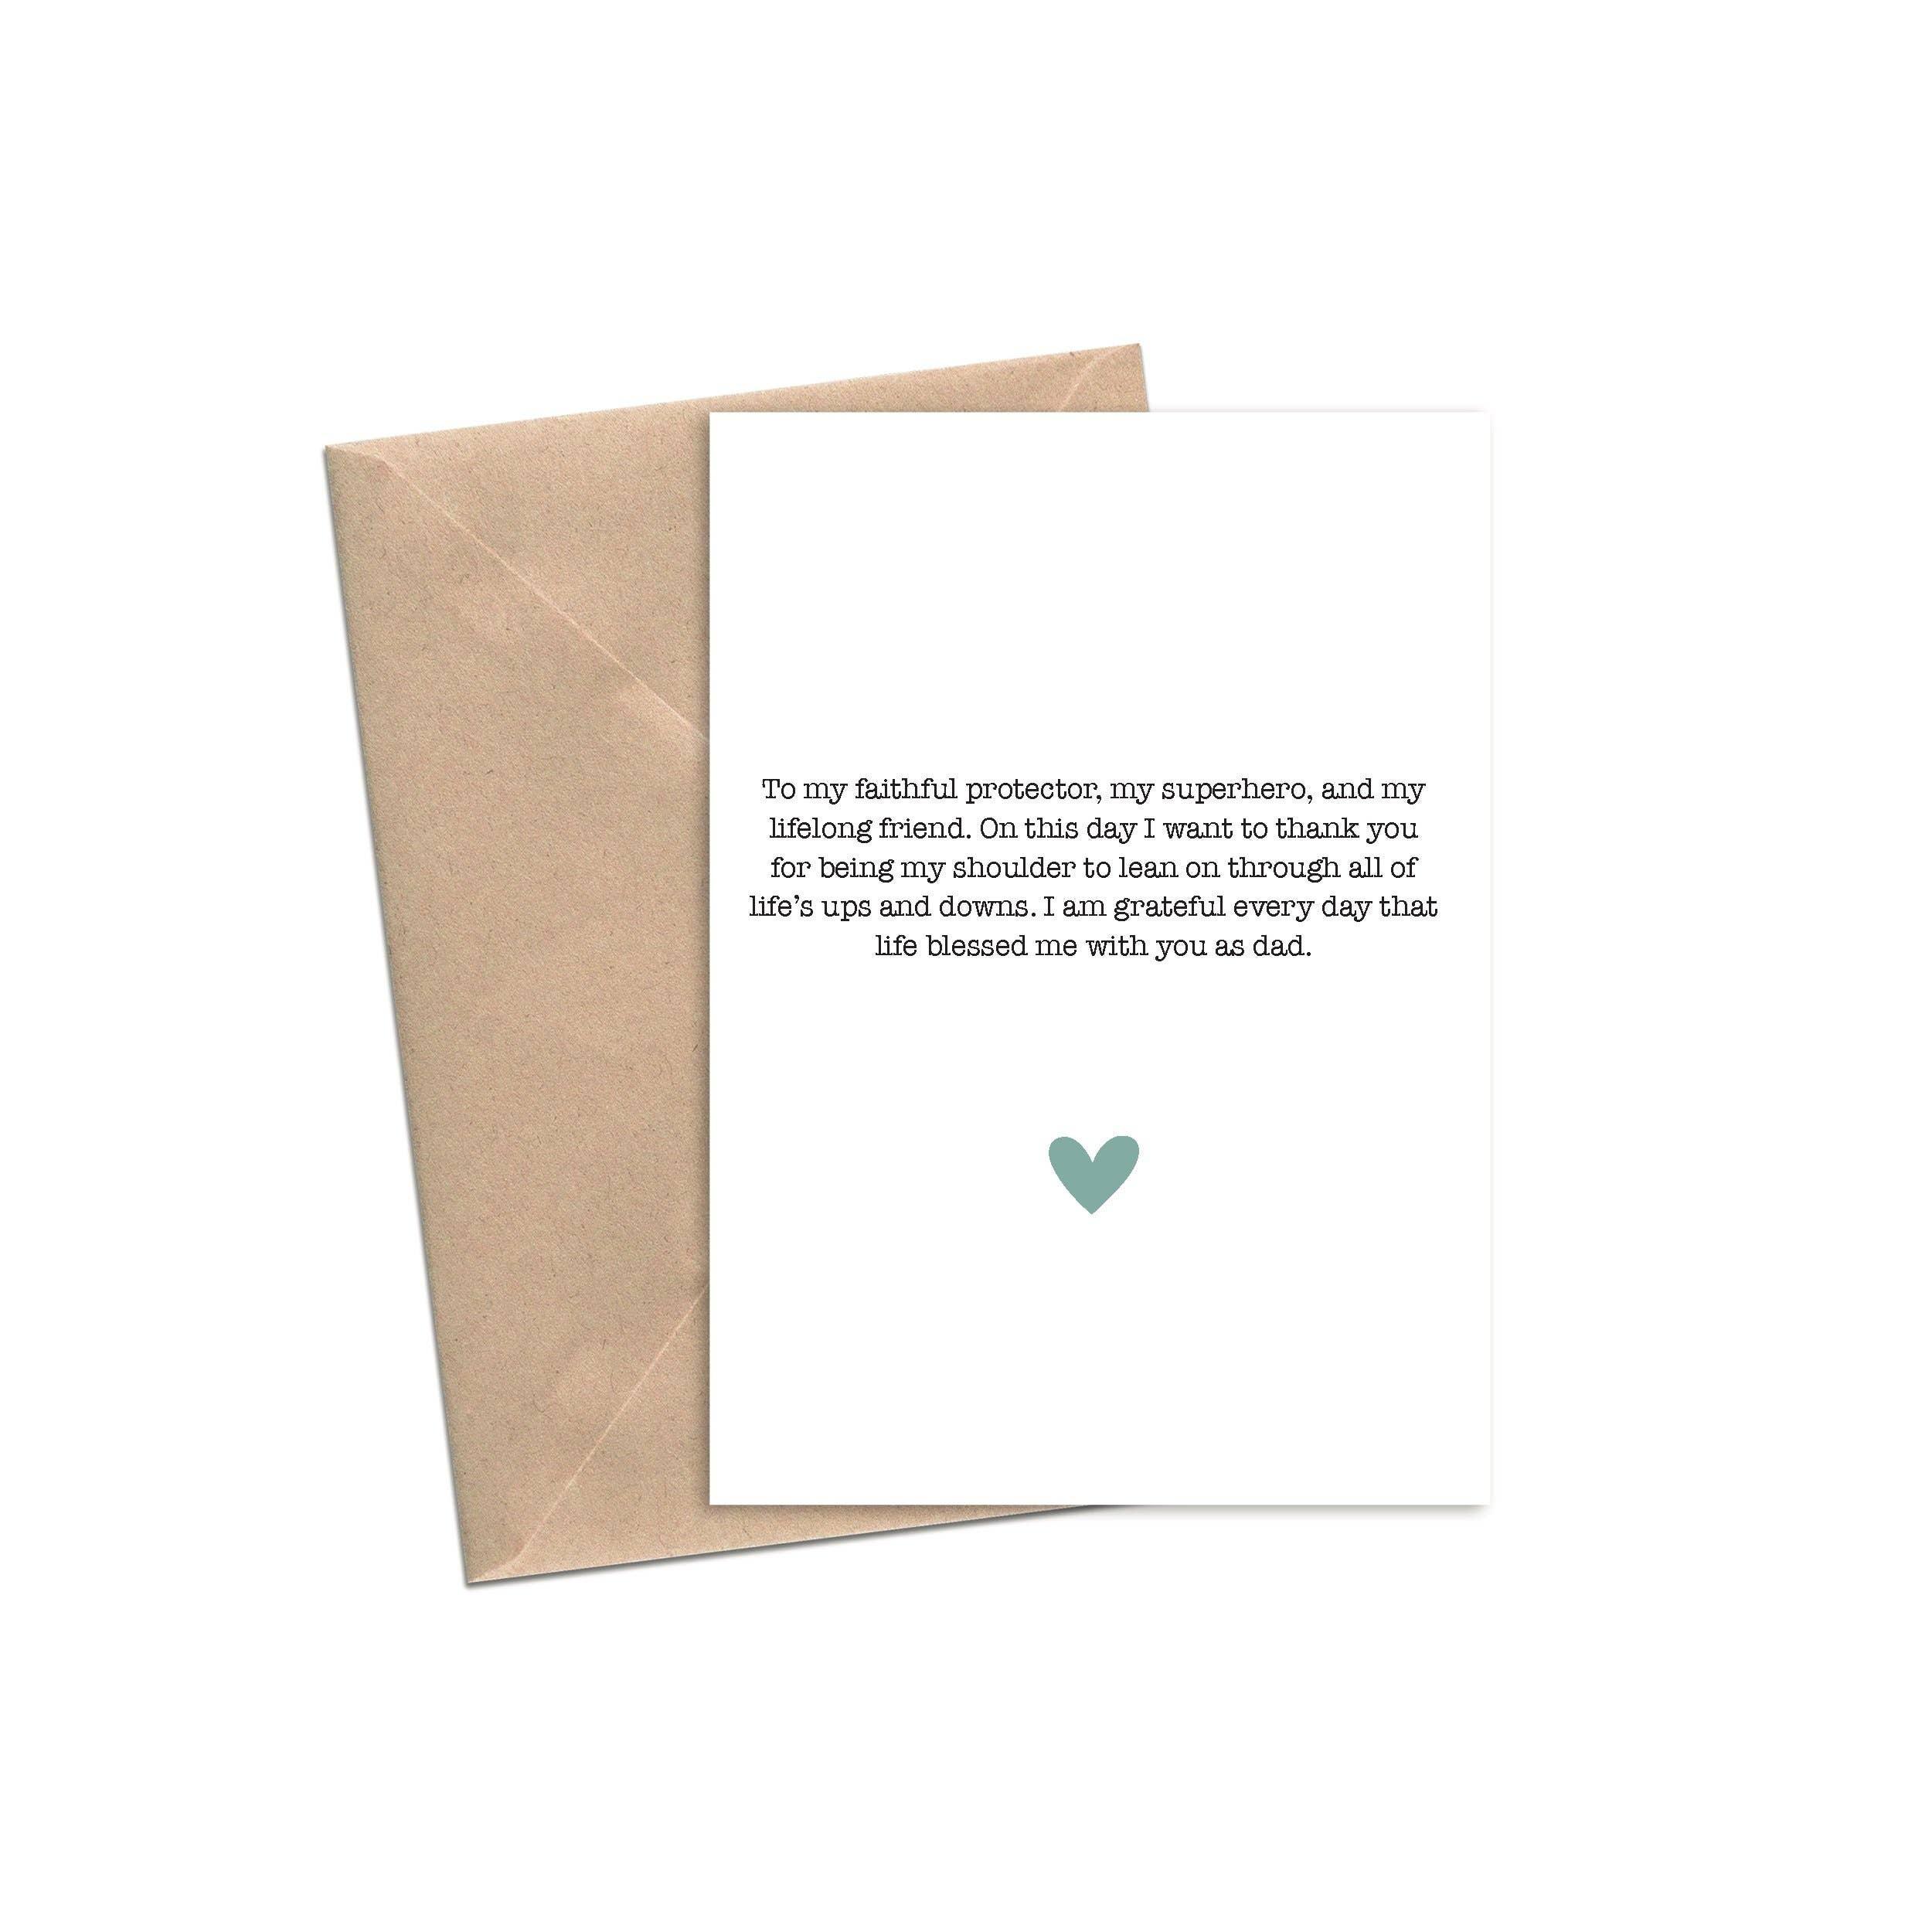 Heartfelt Note to Dad | A2 | Trada Marketplace